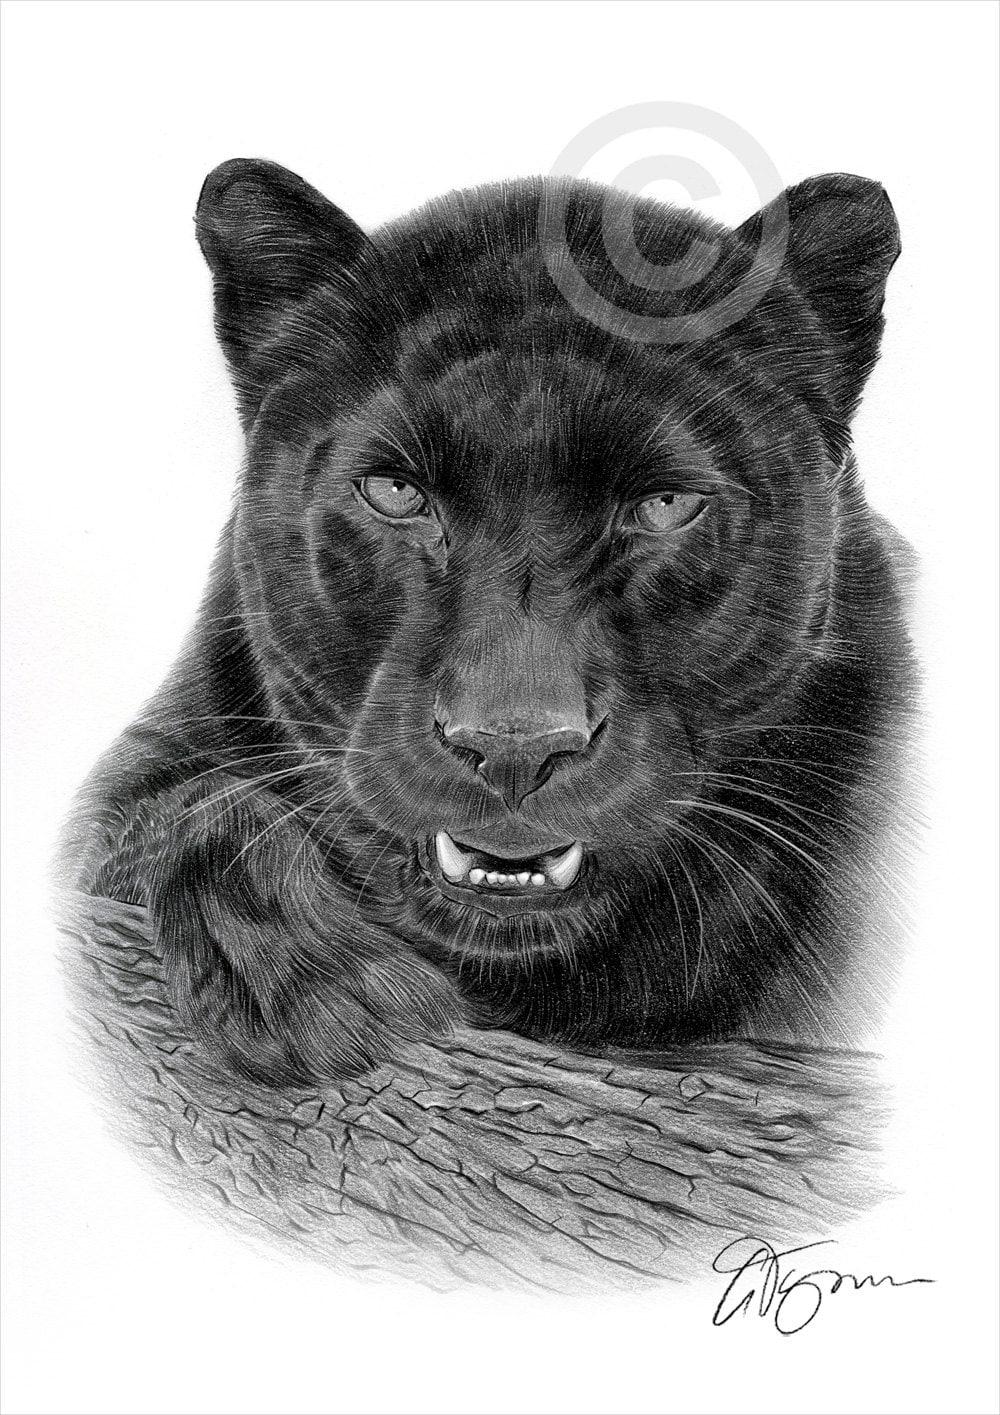 Black Panther pencil drawing art print A4 size artwork